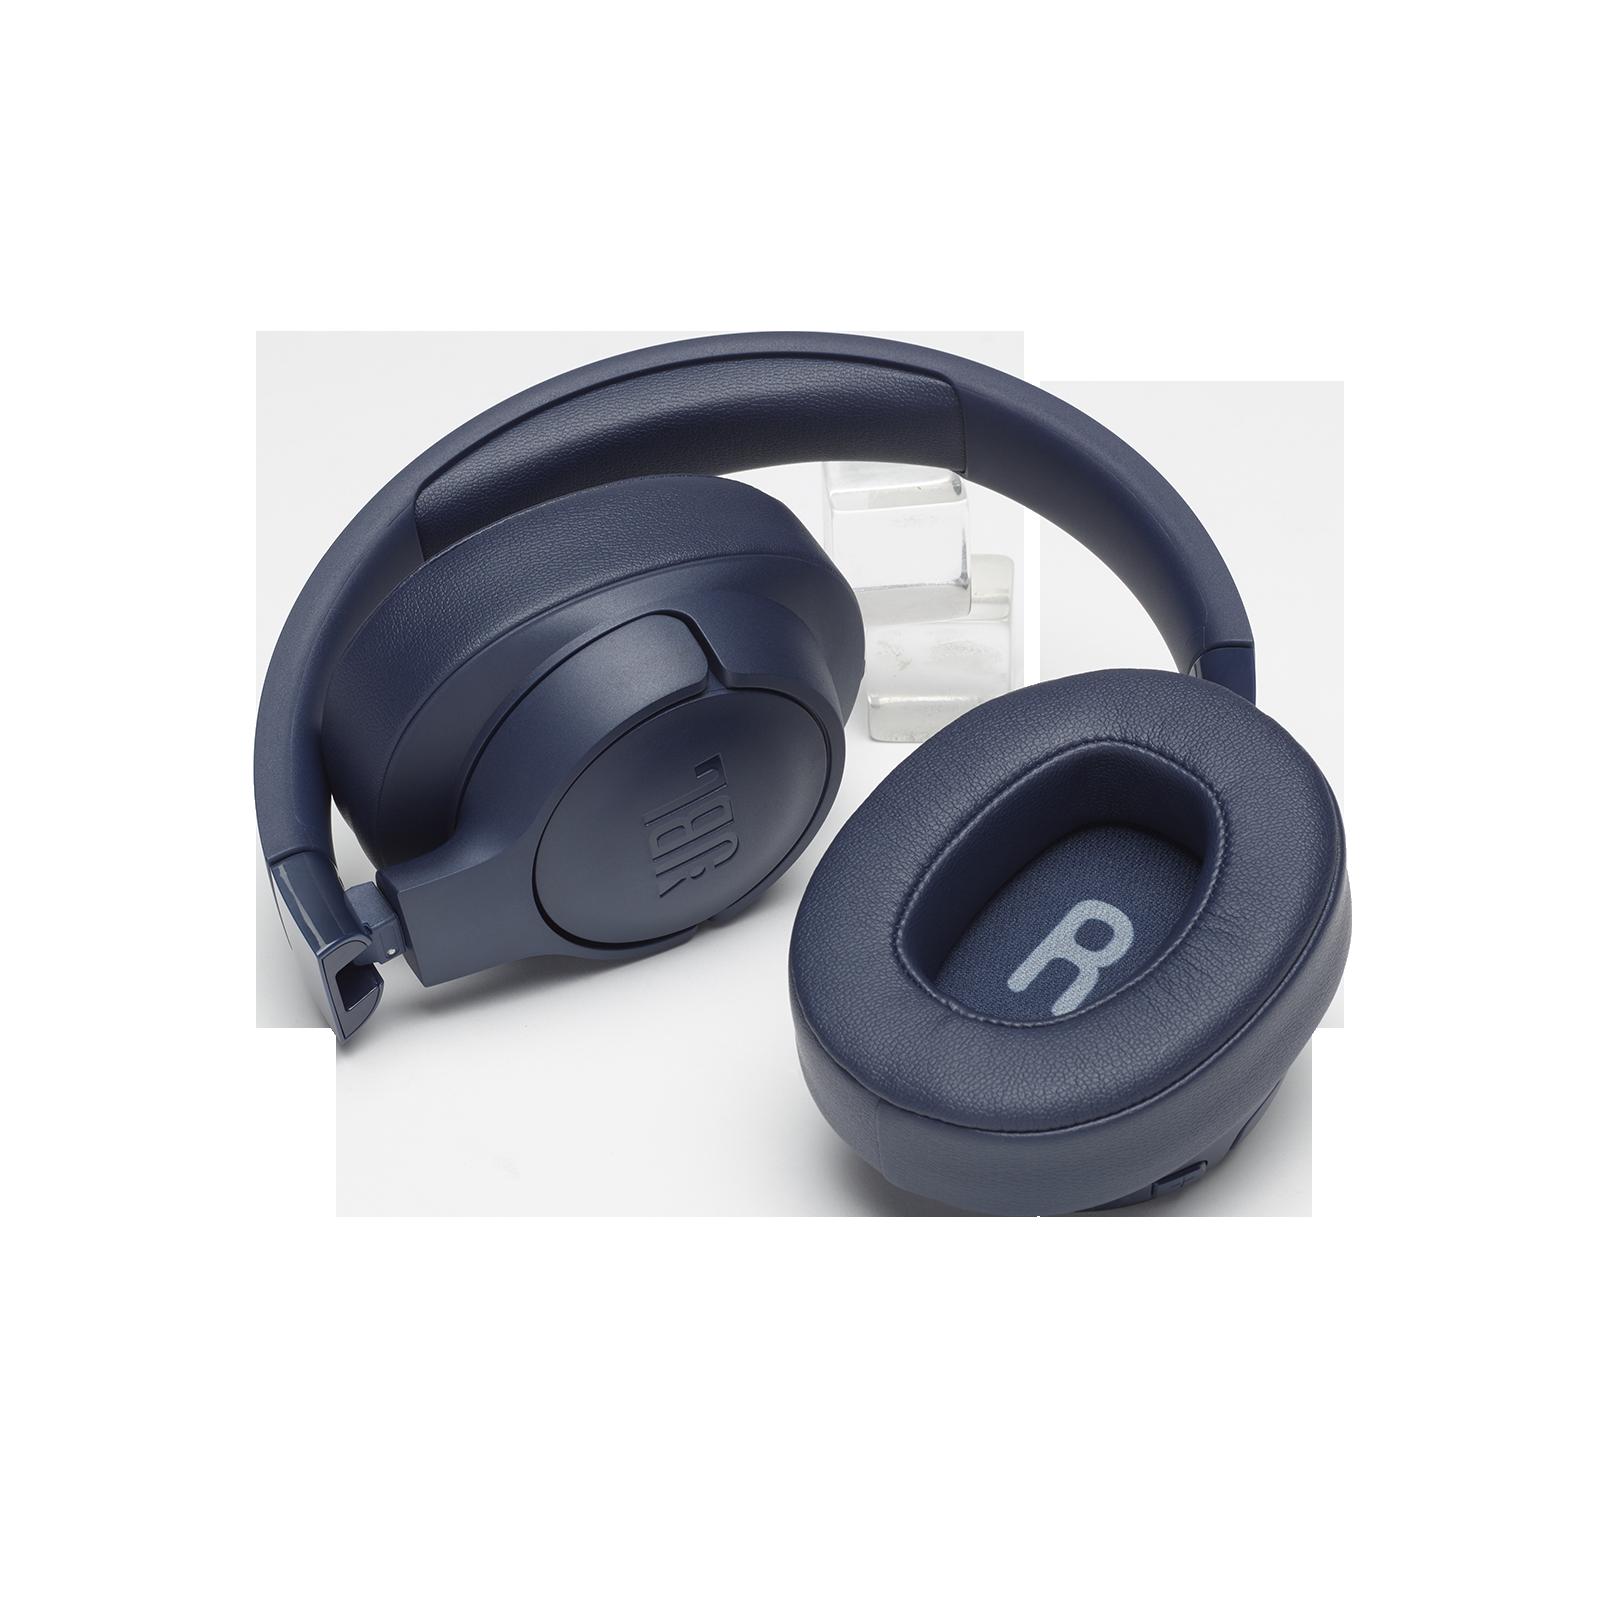 JBL TUNE 700BT - Blue - Wireless Over-Ear Headphones - Detailshot 2